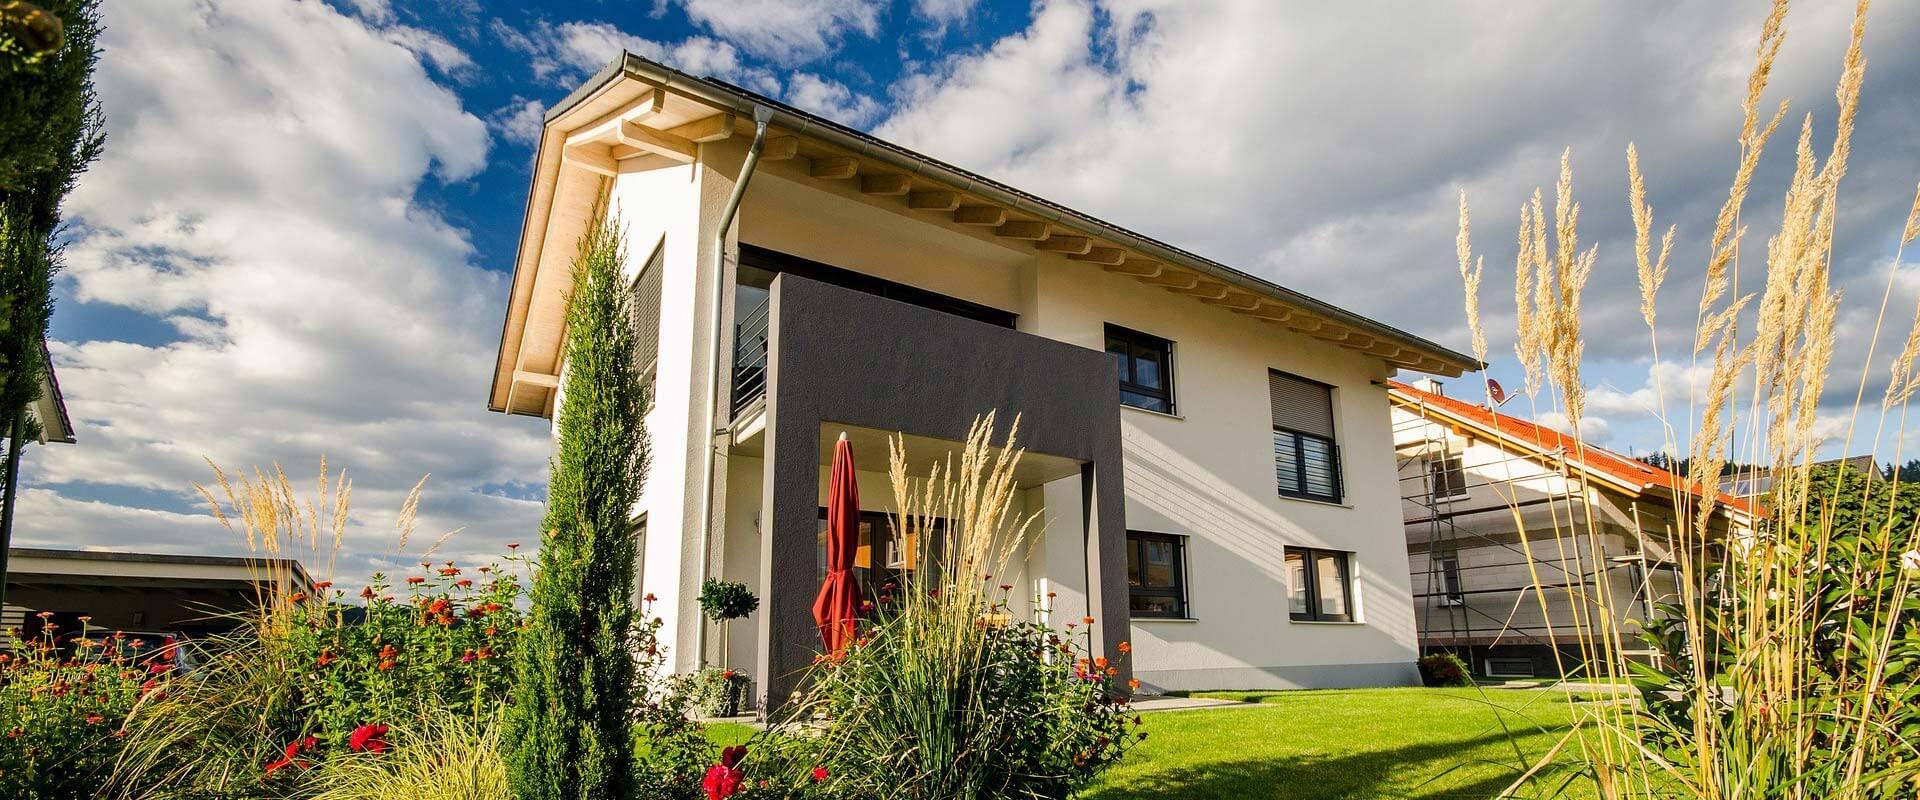 Haus bauen mit Kirchberger